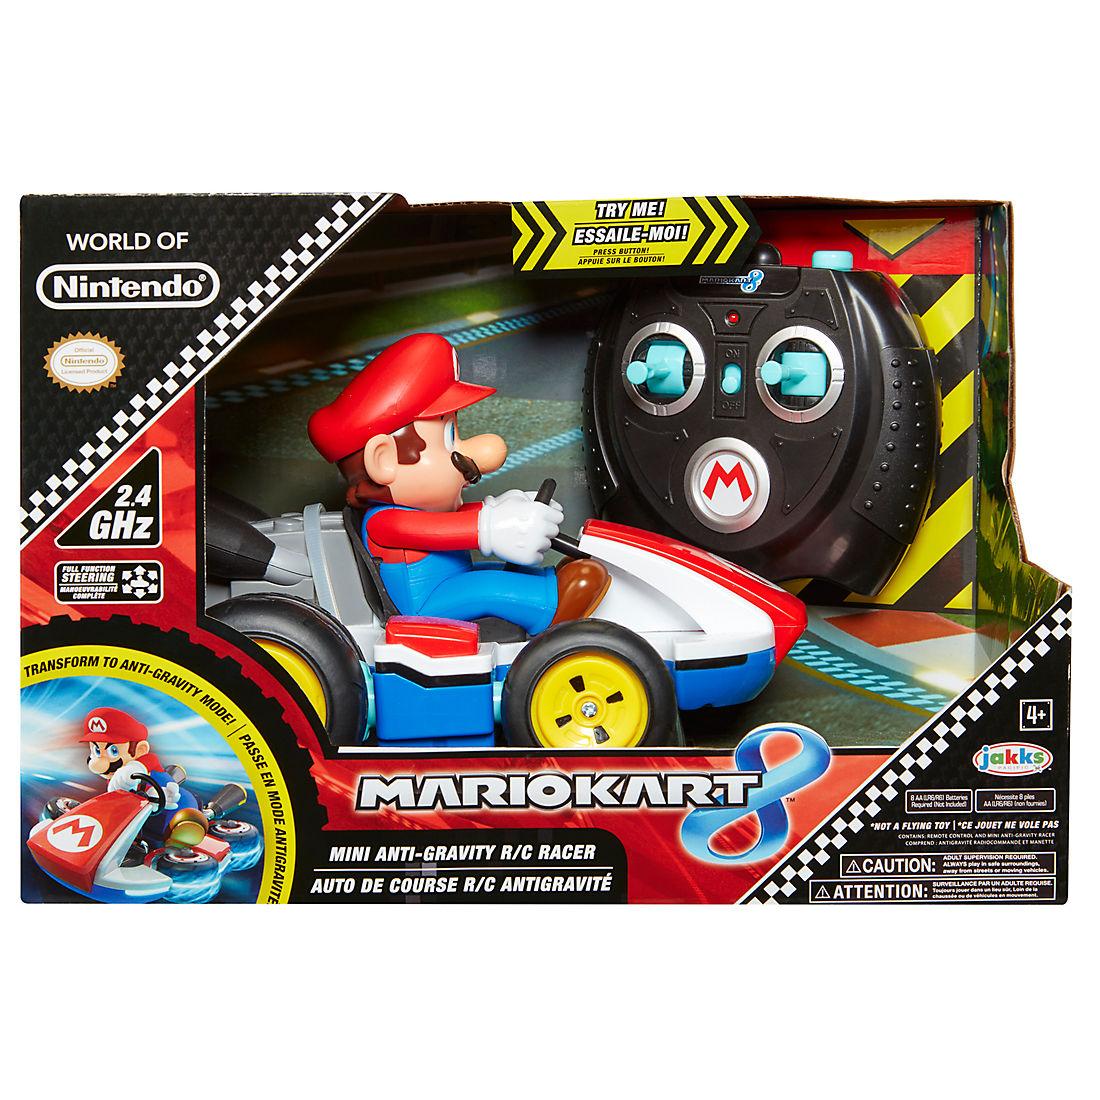 World Of Nintendo Mario Kart